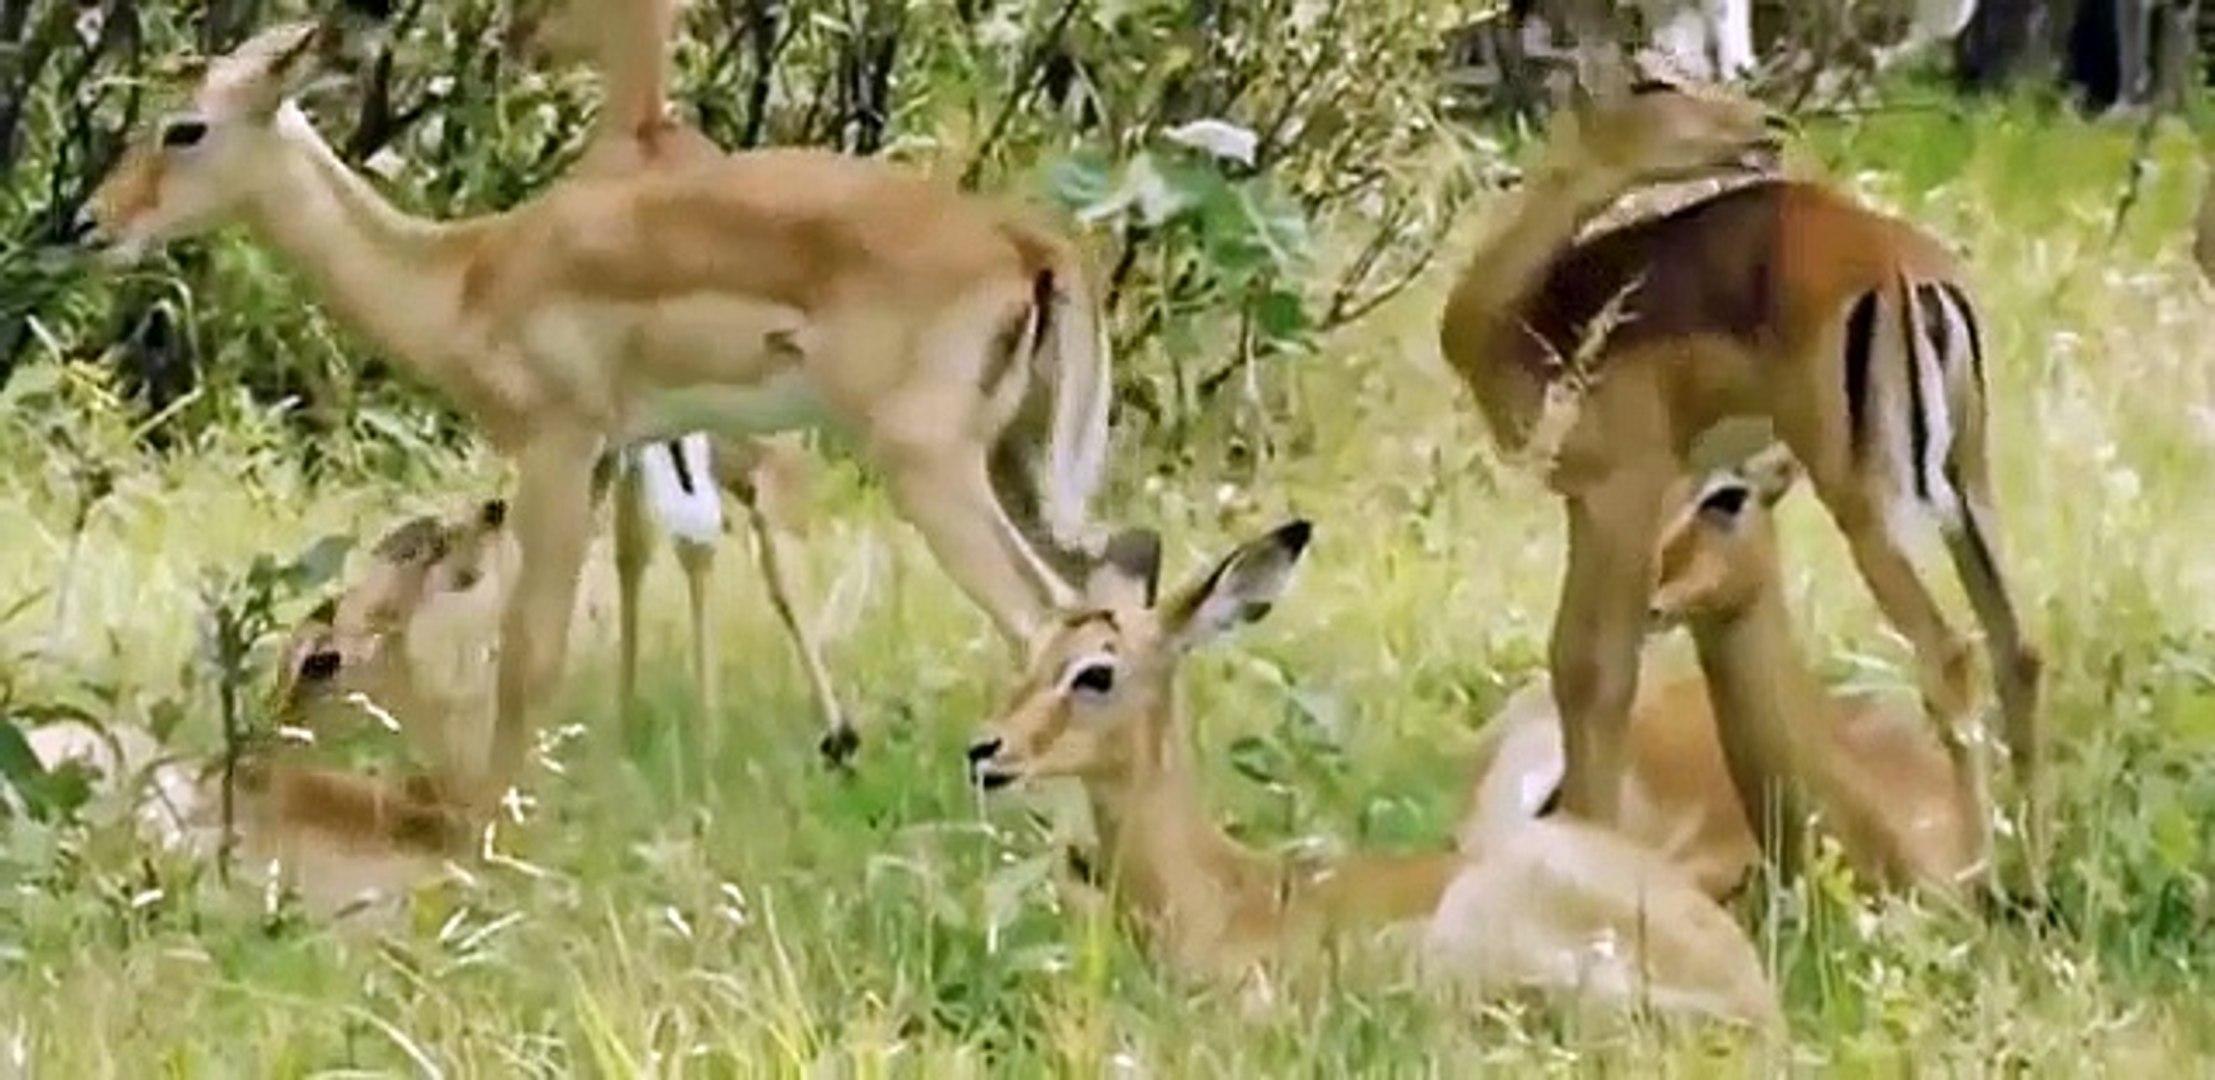 Discovery Animals - Discovery Channel 2015 - Wild Botswana Lion Brotherhood